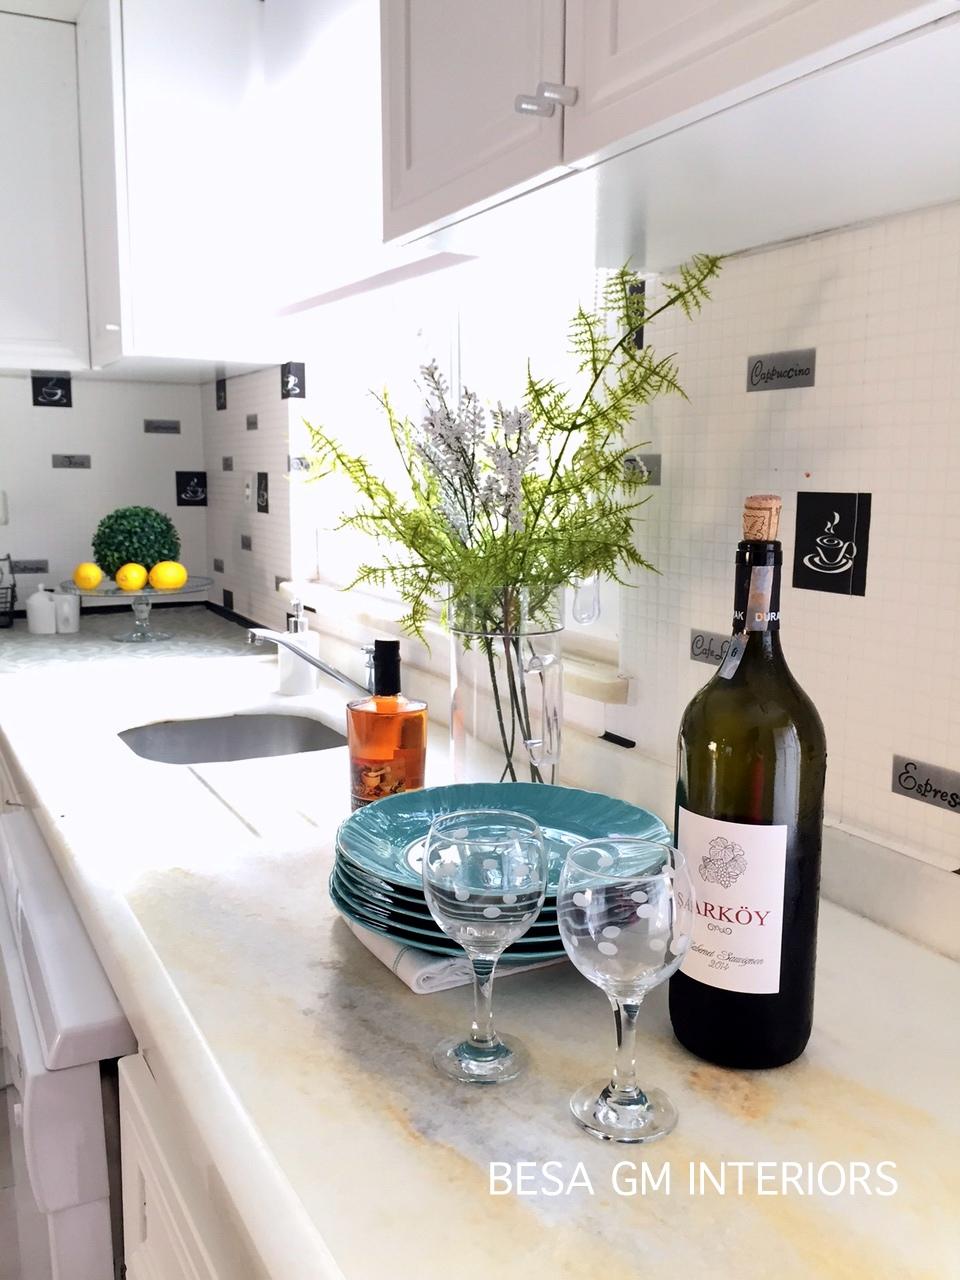 Diy Kitchen Cabinets Makeover Diy Painted Kitchen Cabinets Besa Gm